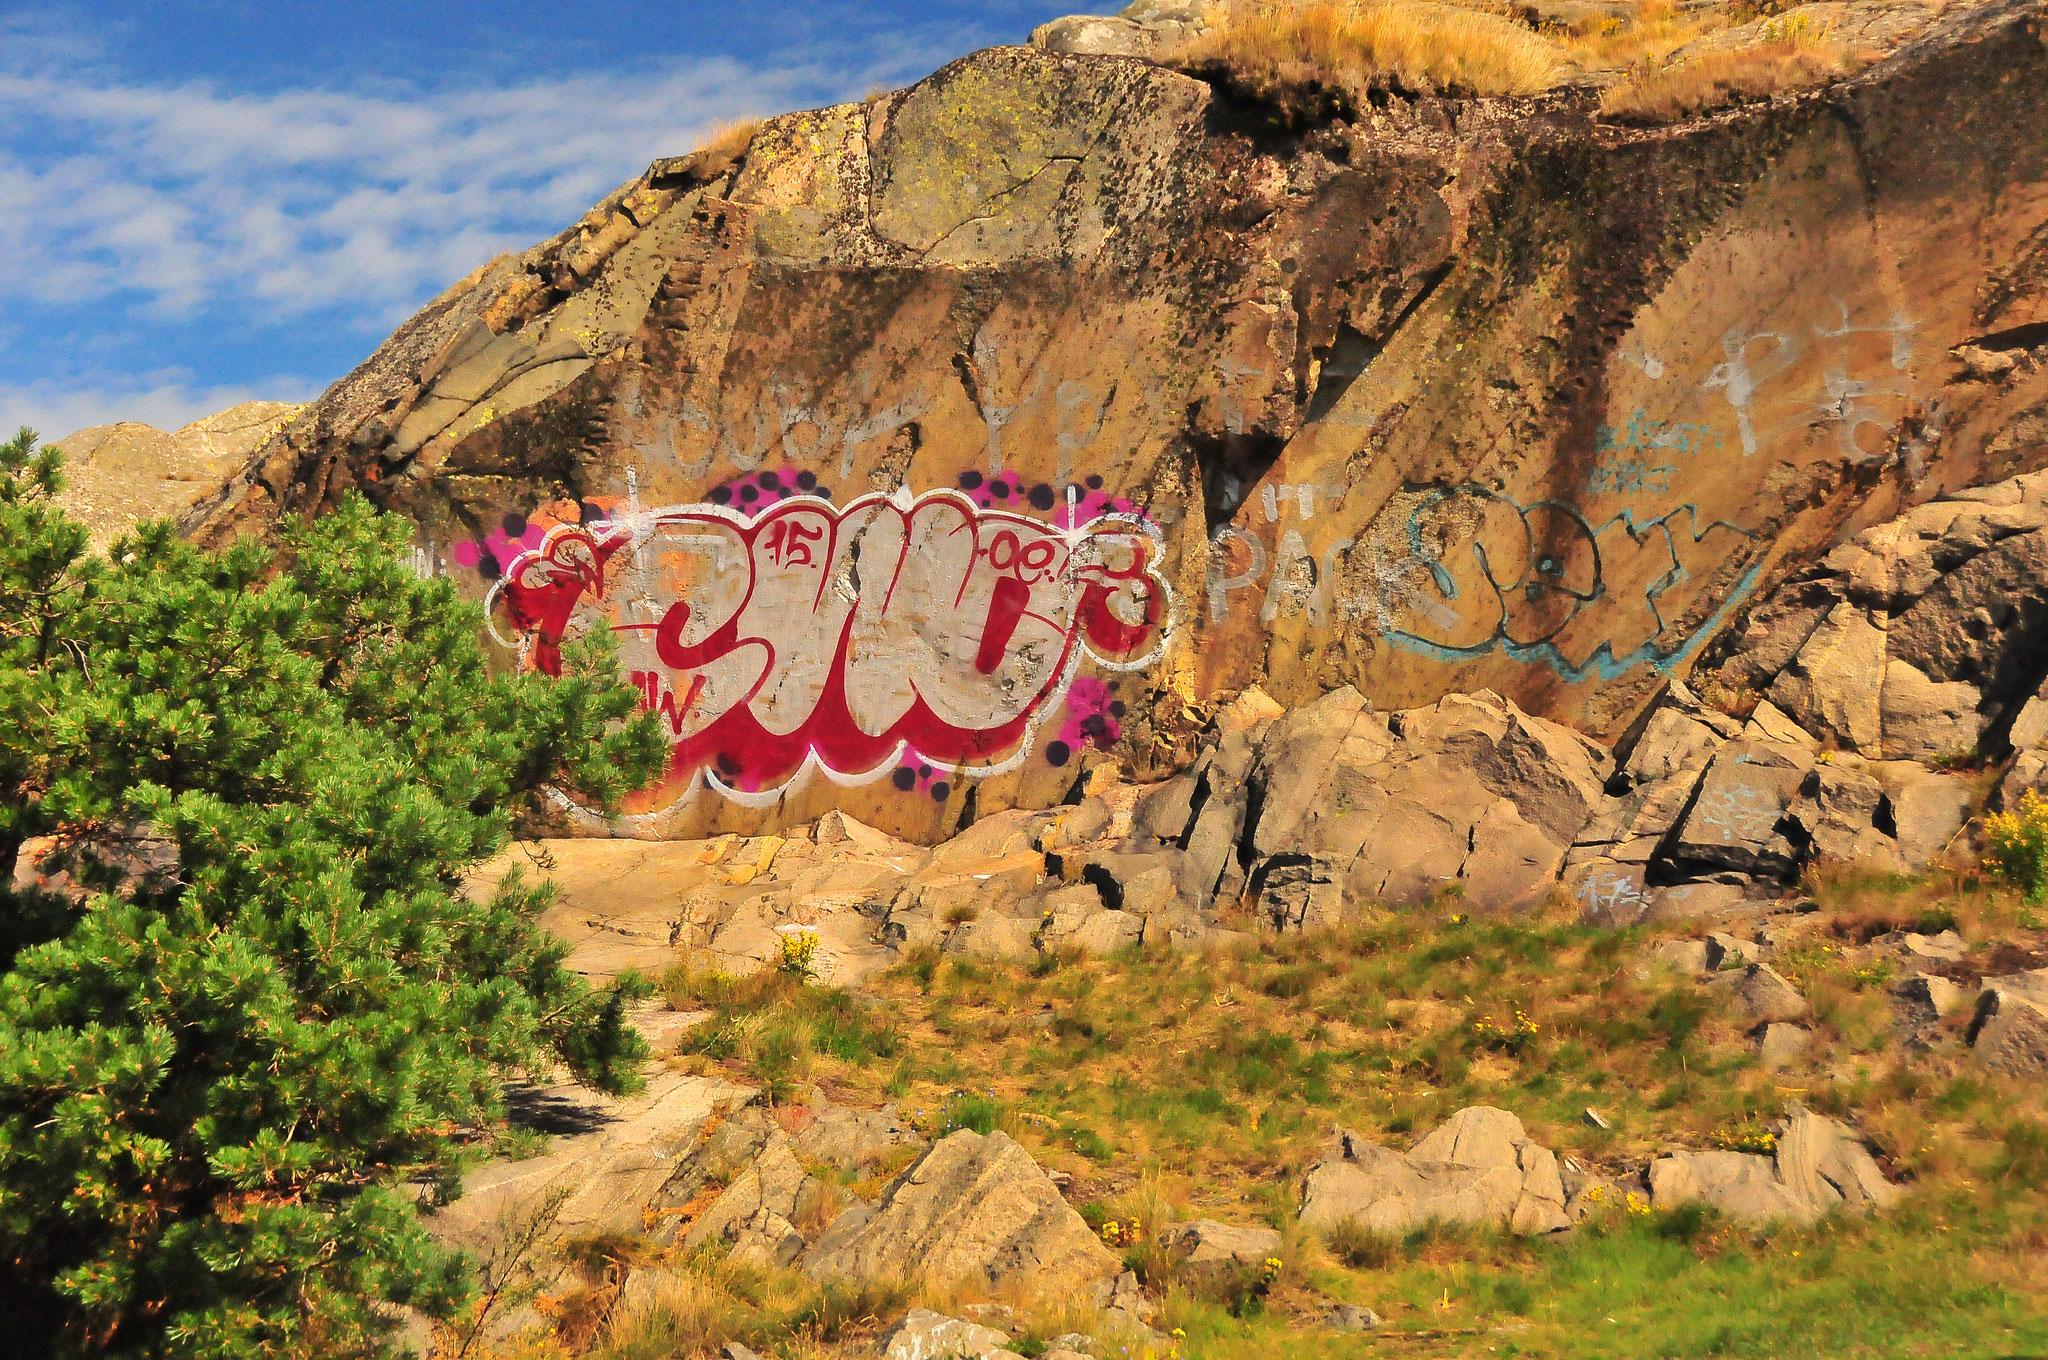 Graffiti On The Rocks